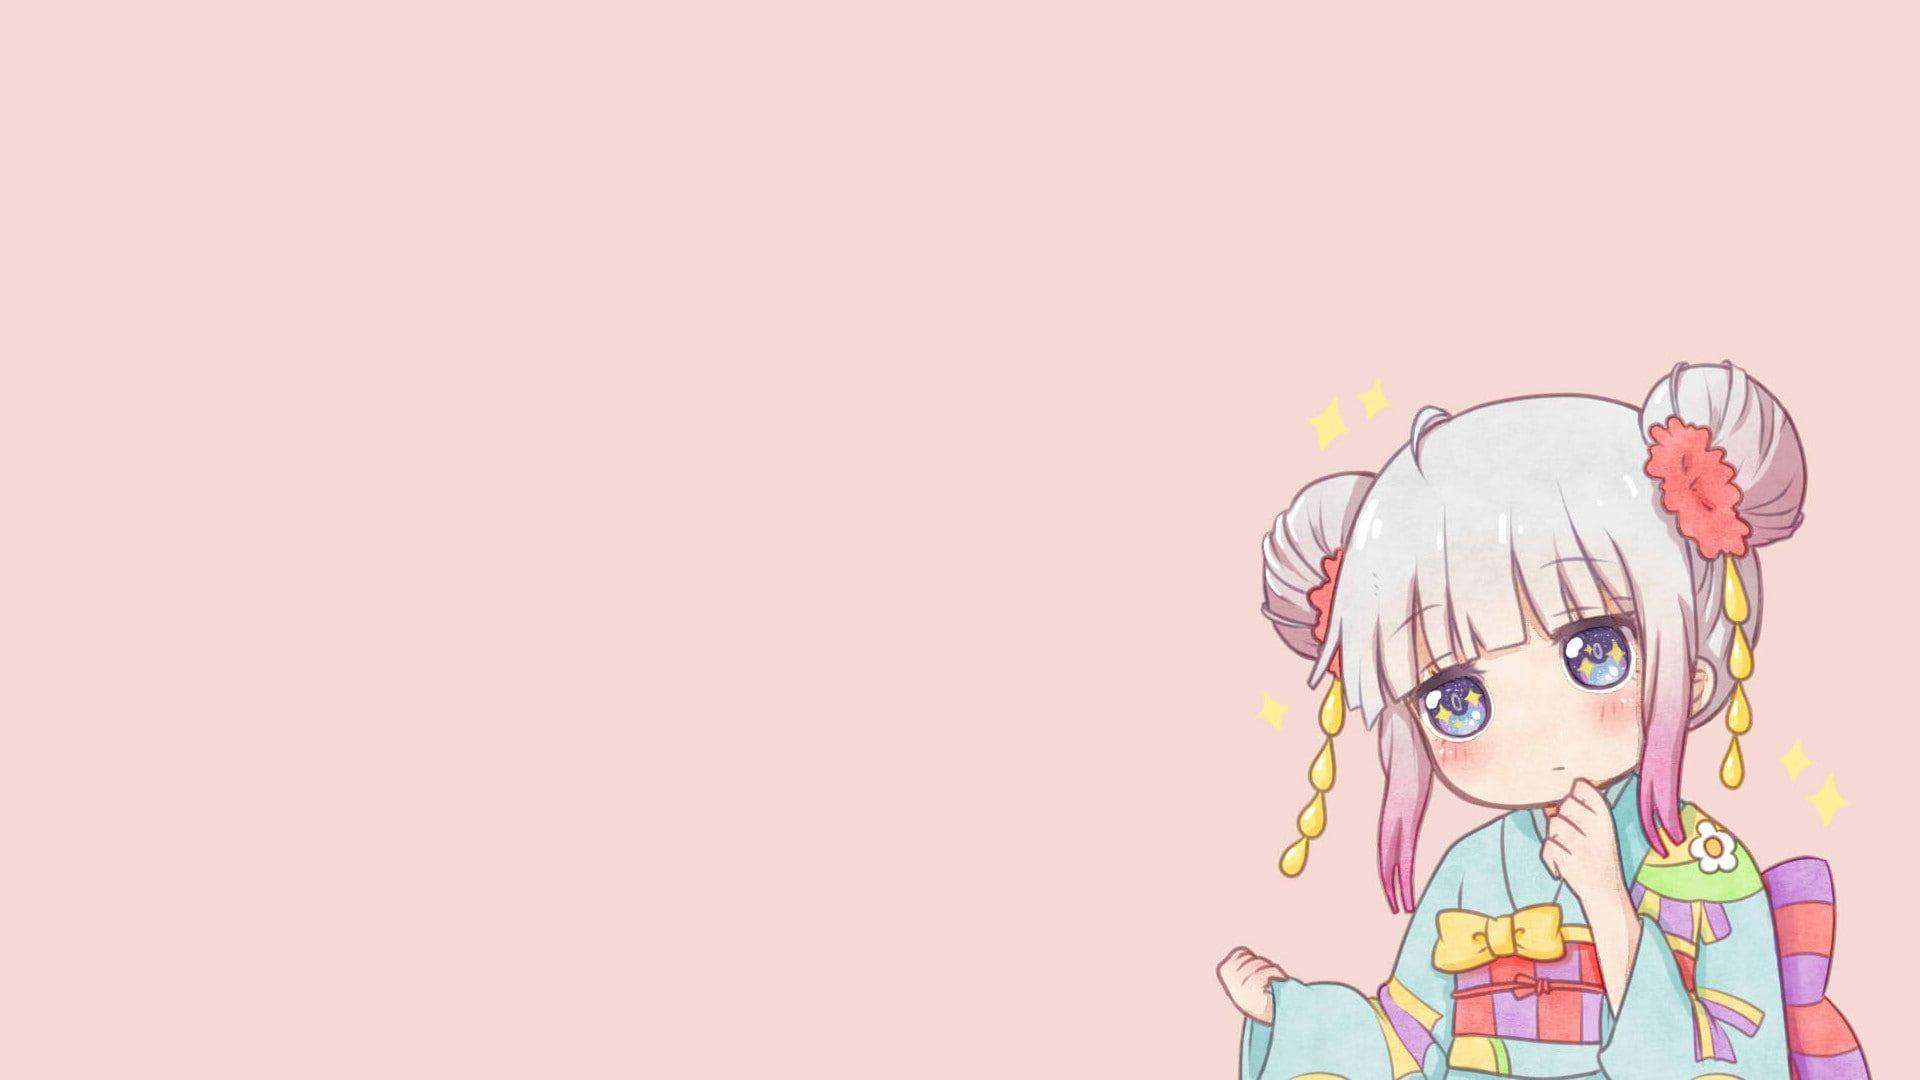 HD wallpaper: kanna kamui, kimono, kobayashi-san chi no maid dragon, Anime